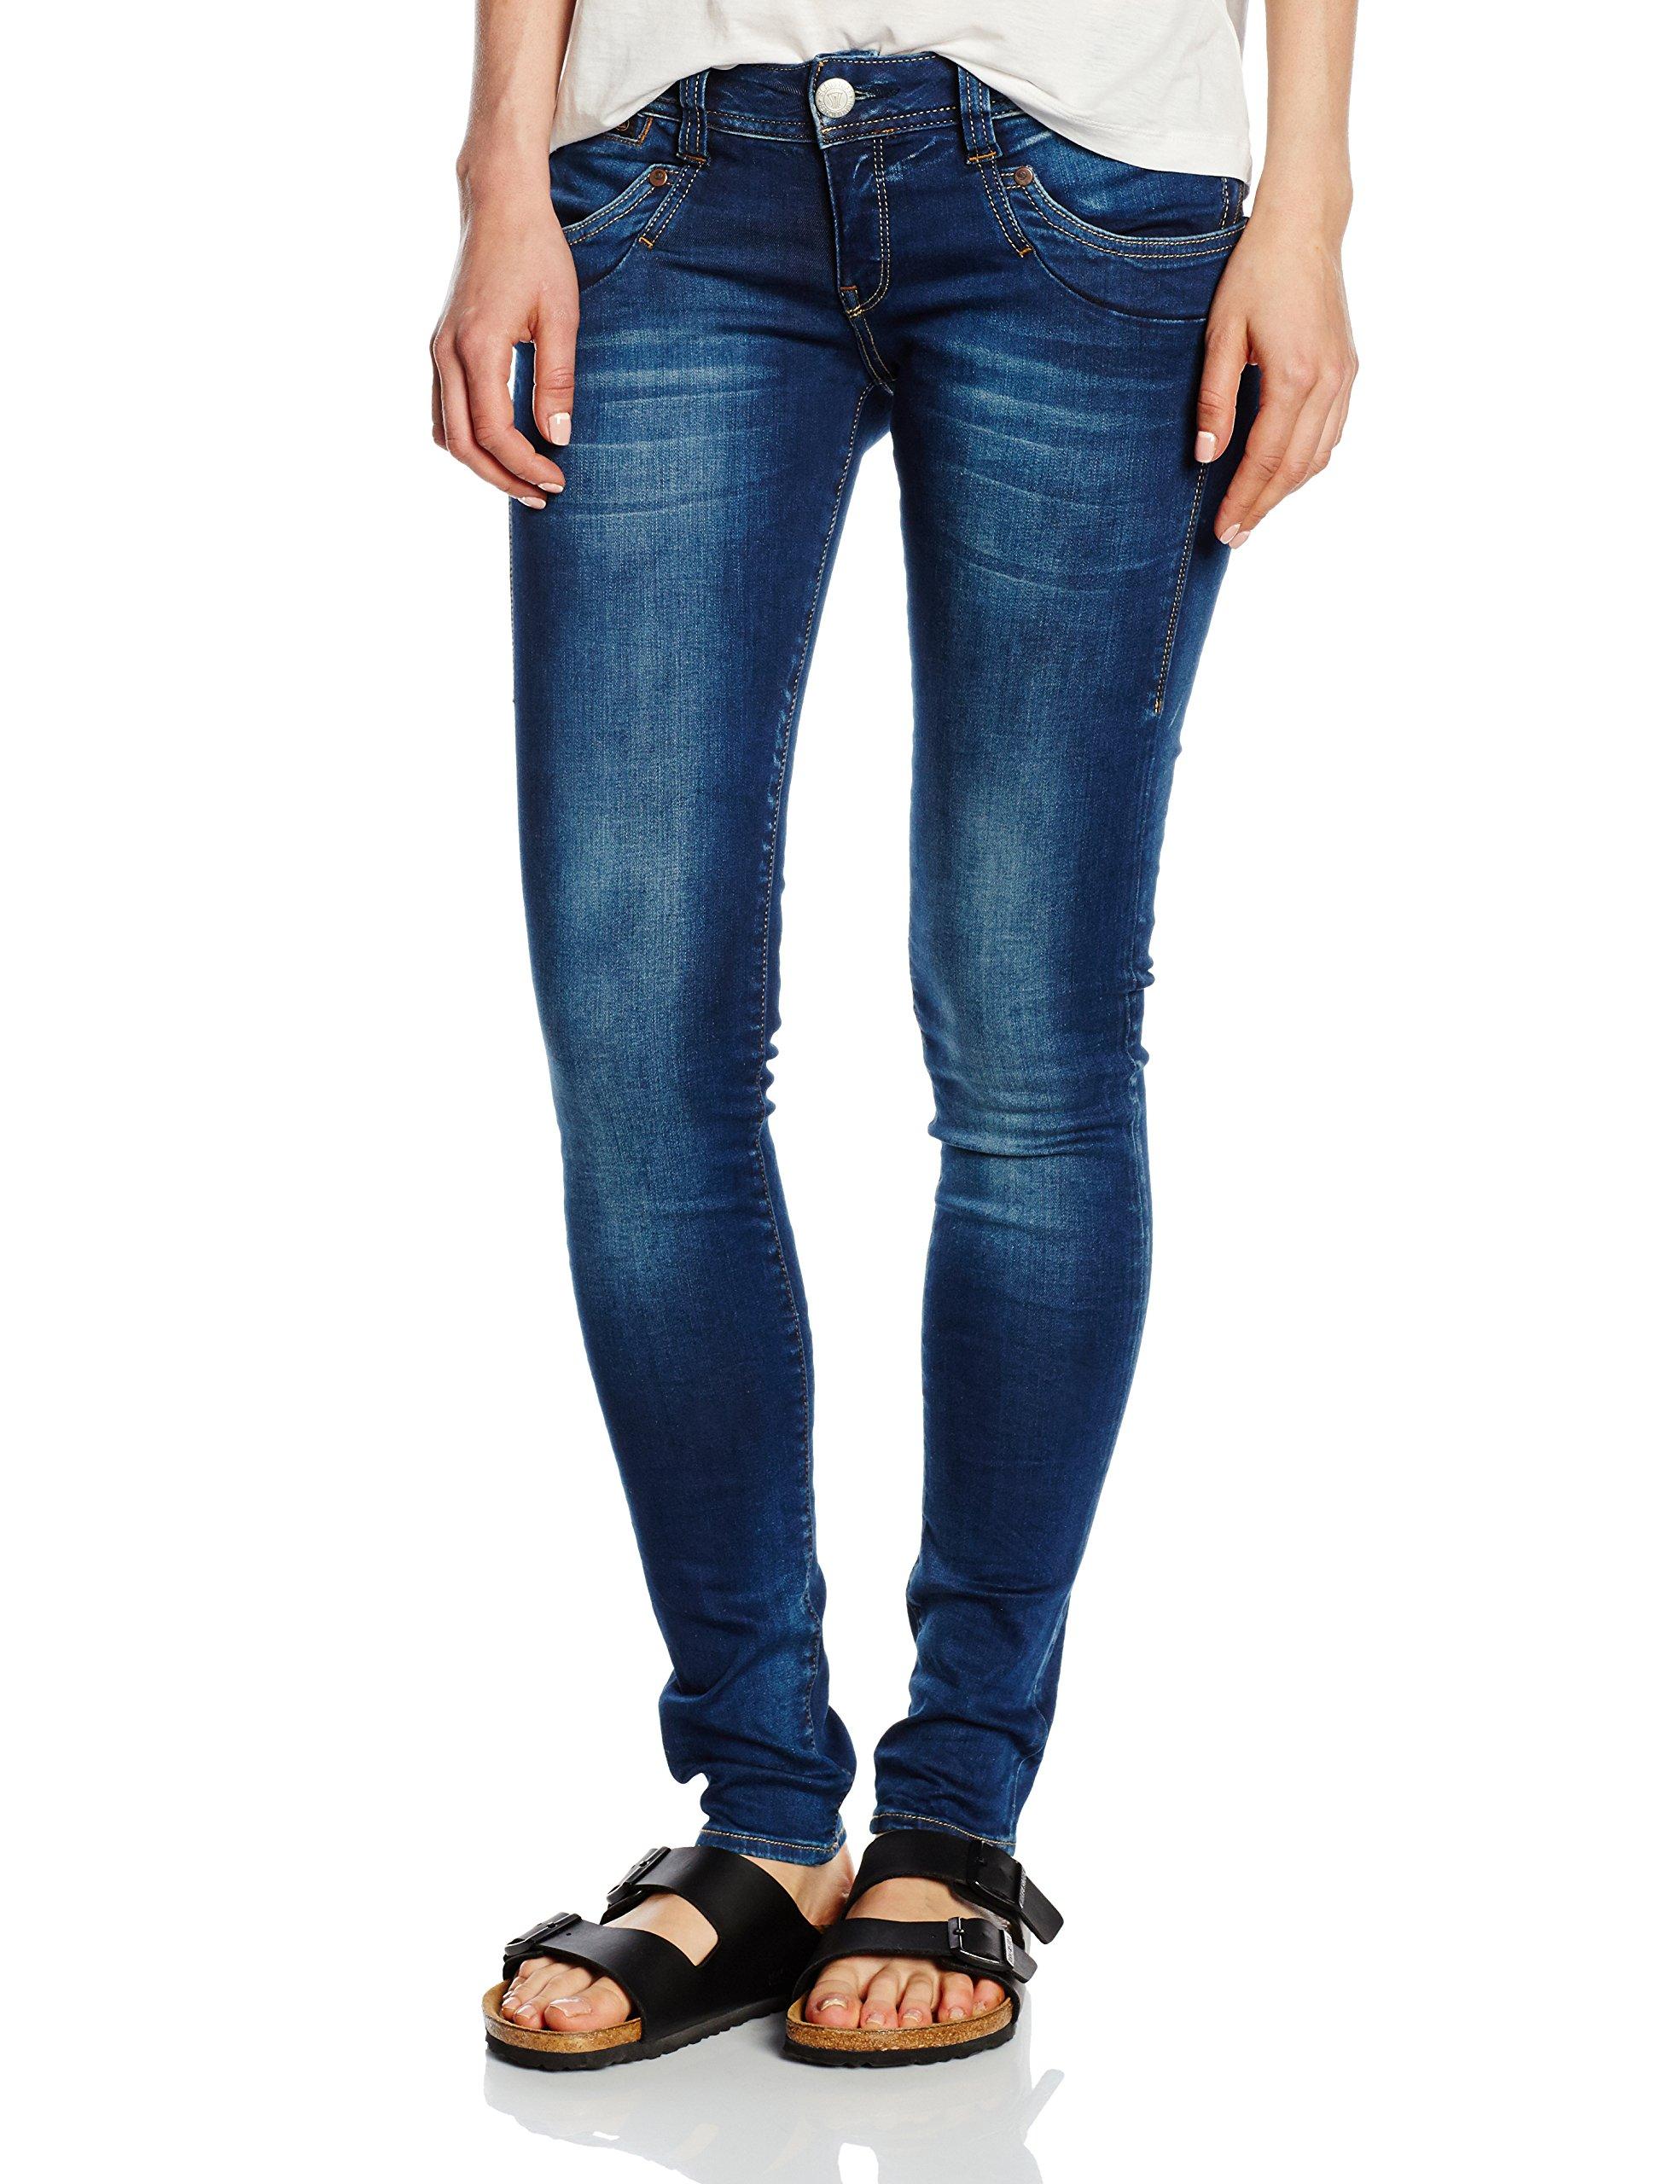 Denim Herrlicher FemmeBleueasy PowerstretchJeans 32 Blue 084024 L Piper W Slim nNw80mv